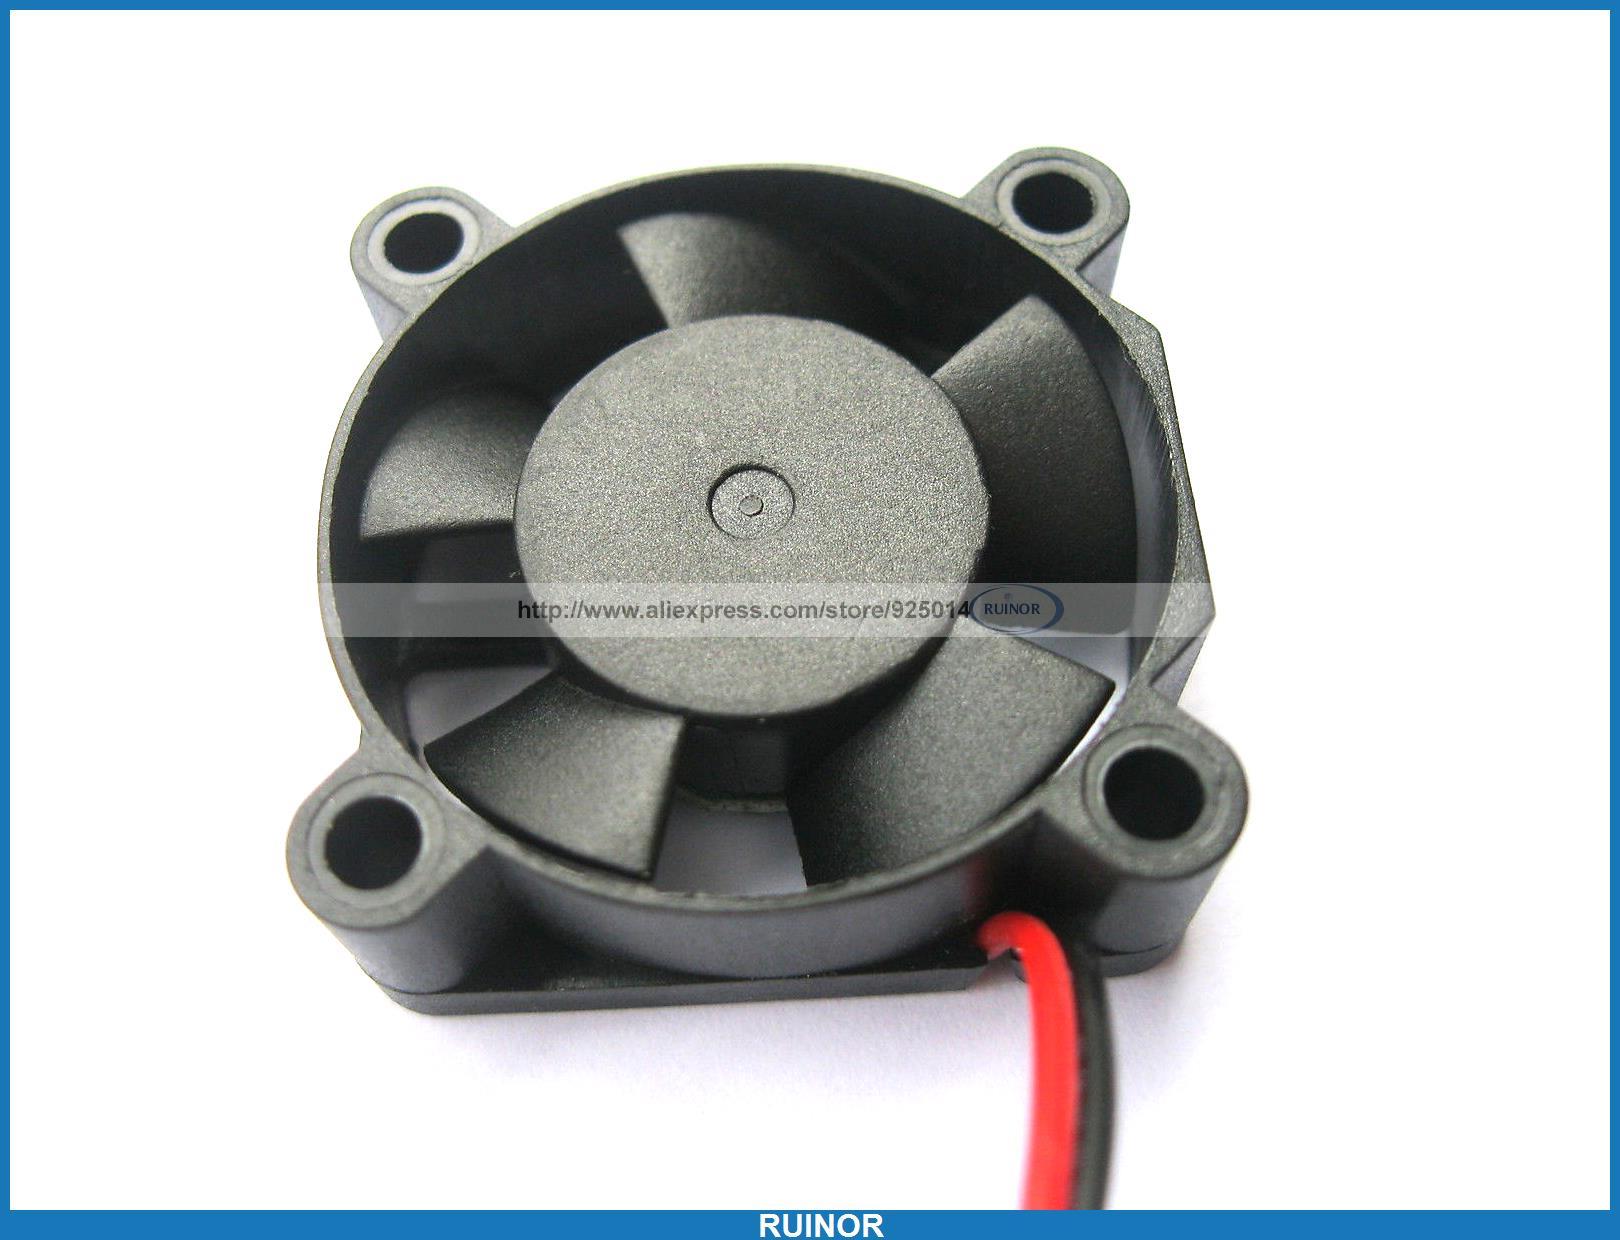 10 Pcs Brushless DC Cooling 5 Blade Fan 3010s 5V 30x30x10mm 2 Pin<br><br>Aliexpress